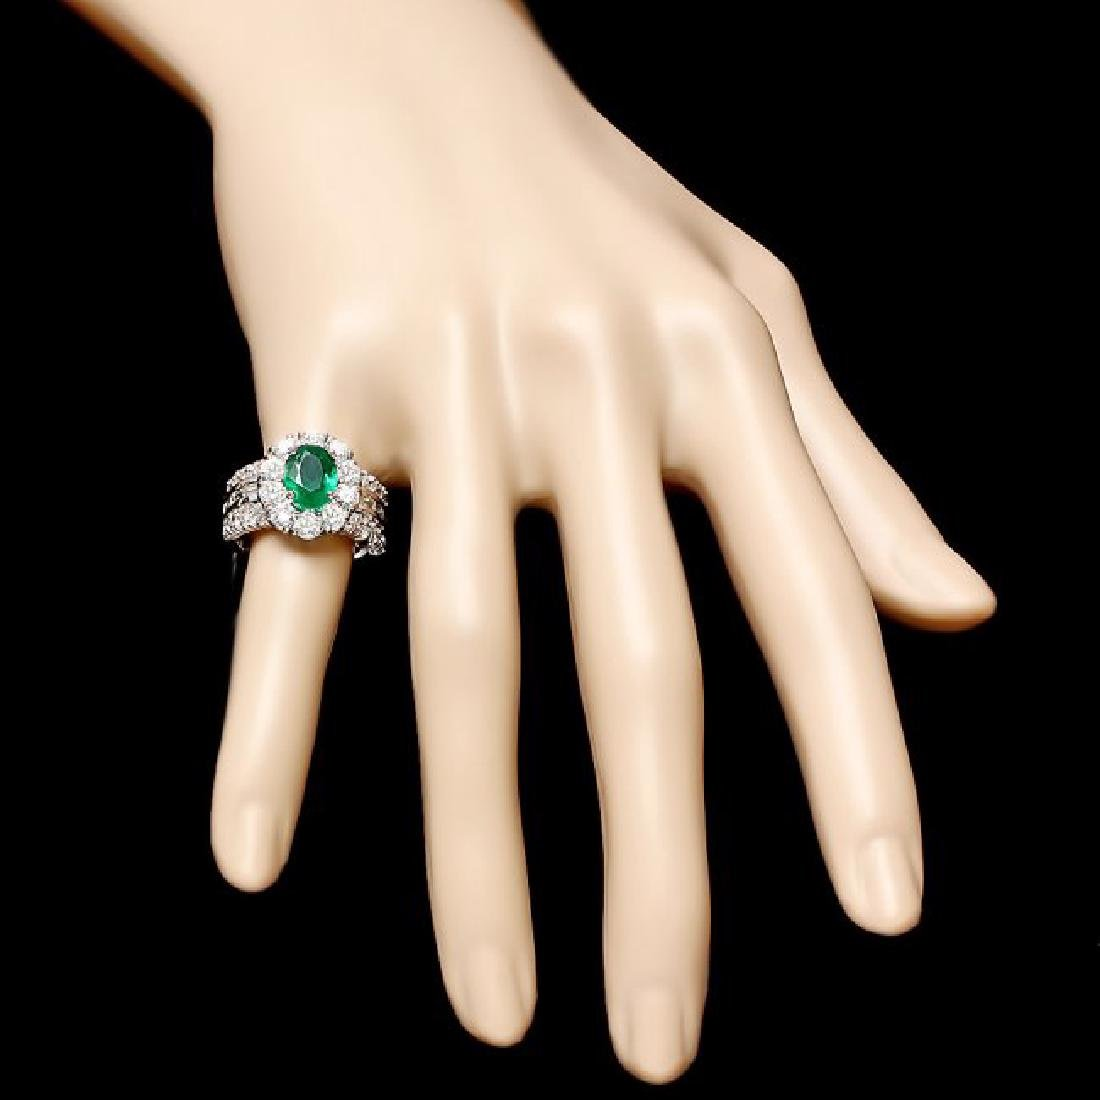 14k White Gold 2.10ct Emerald 3ct Diamond Ring - 4